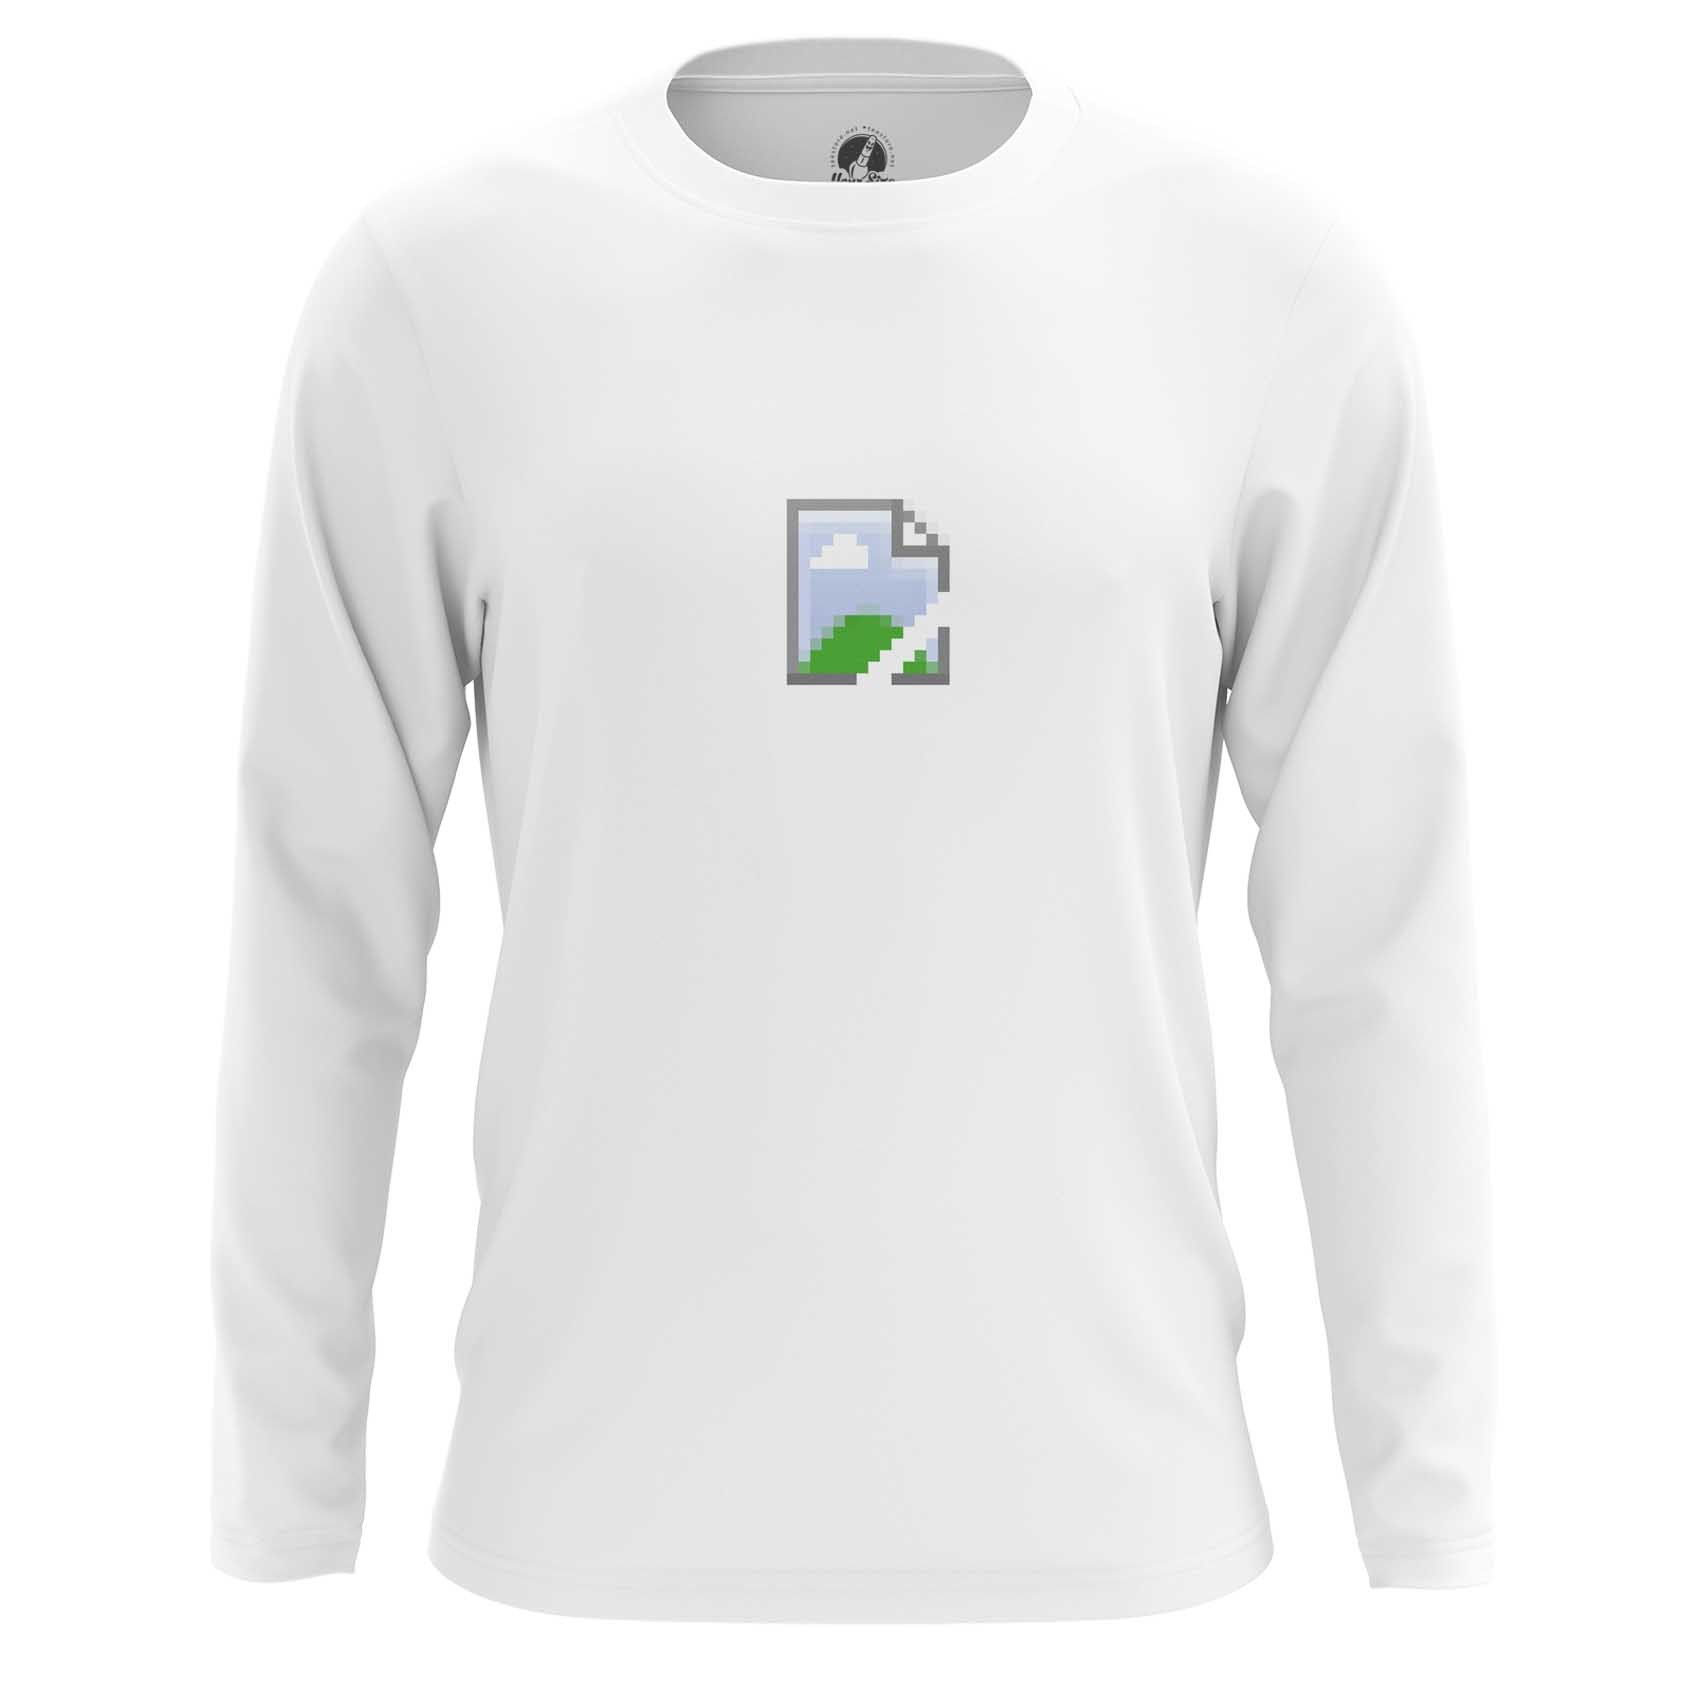 Collectibles Tank Pic Icon No Image Web Art Fun Vest